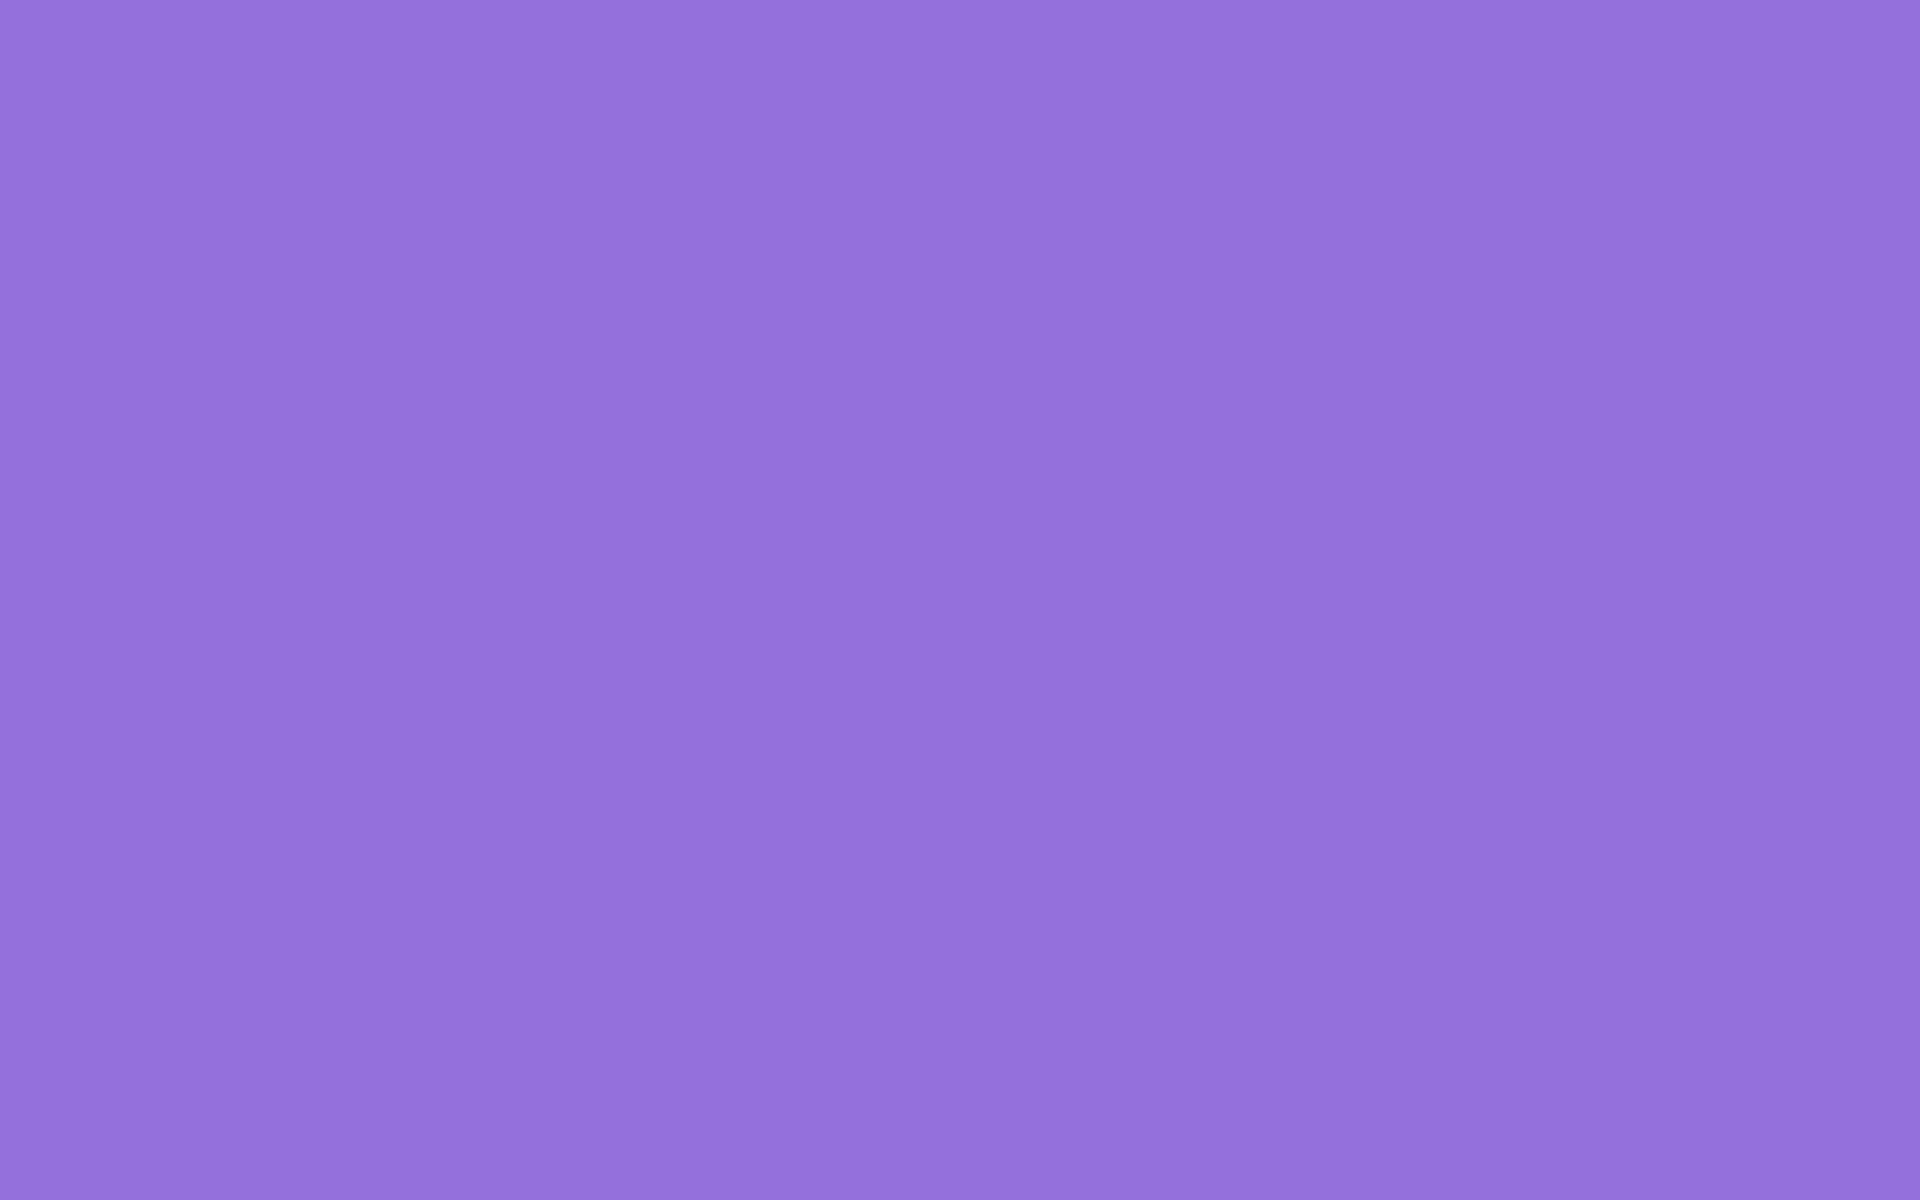 1920x1200 Medium Purple Solid Color Background